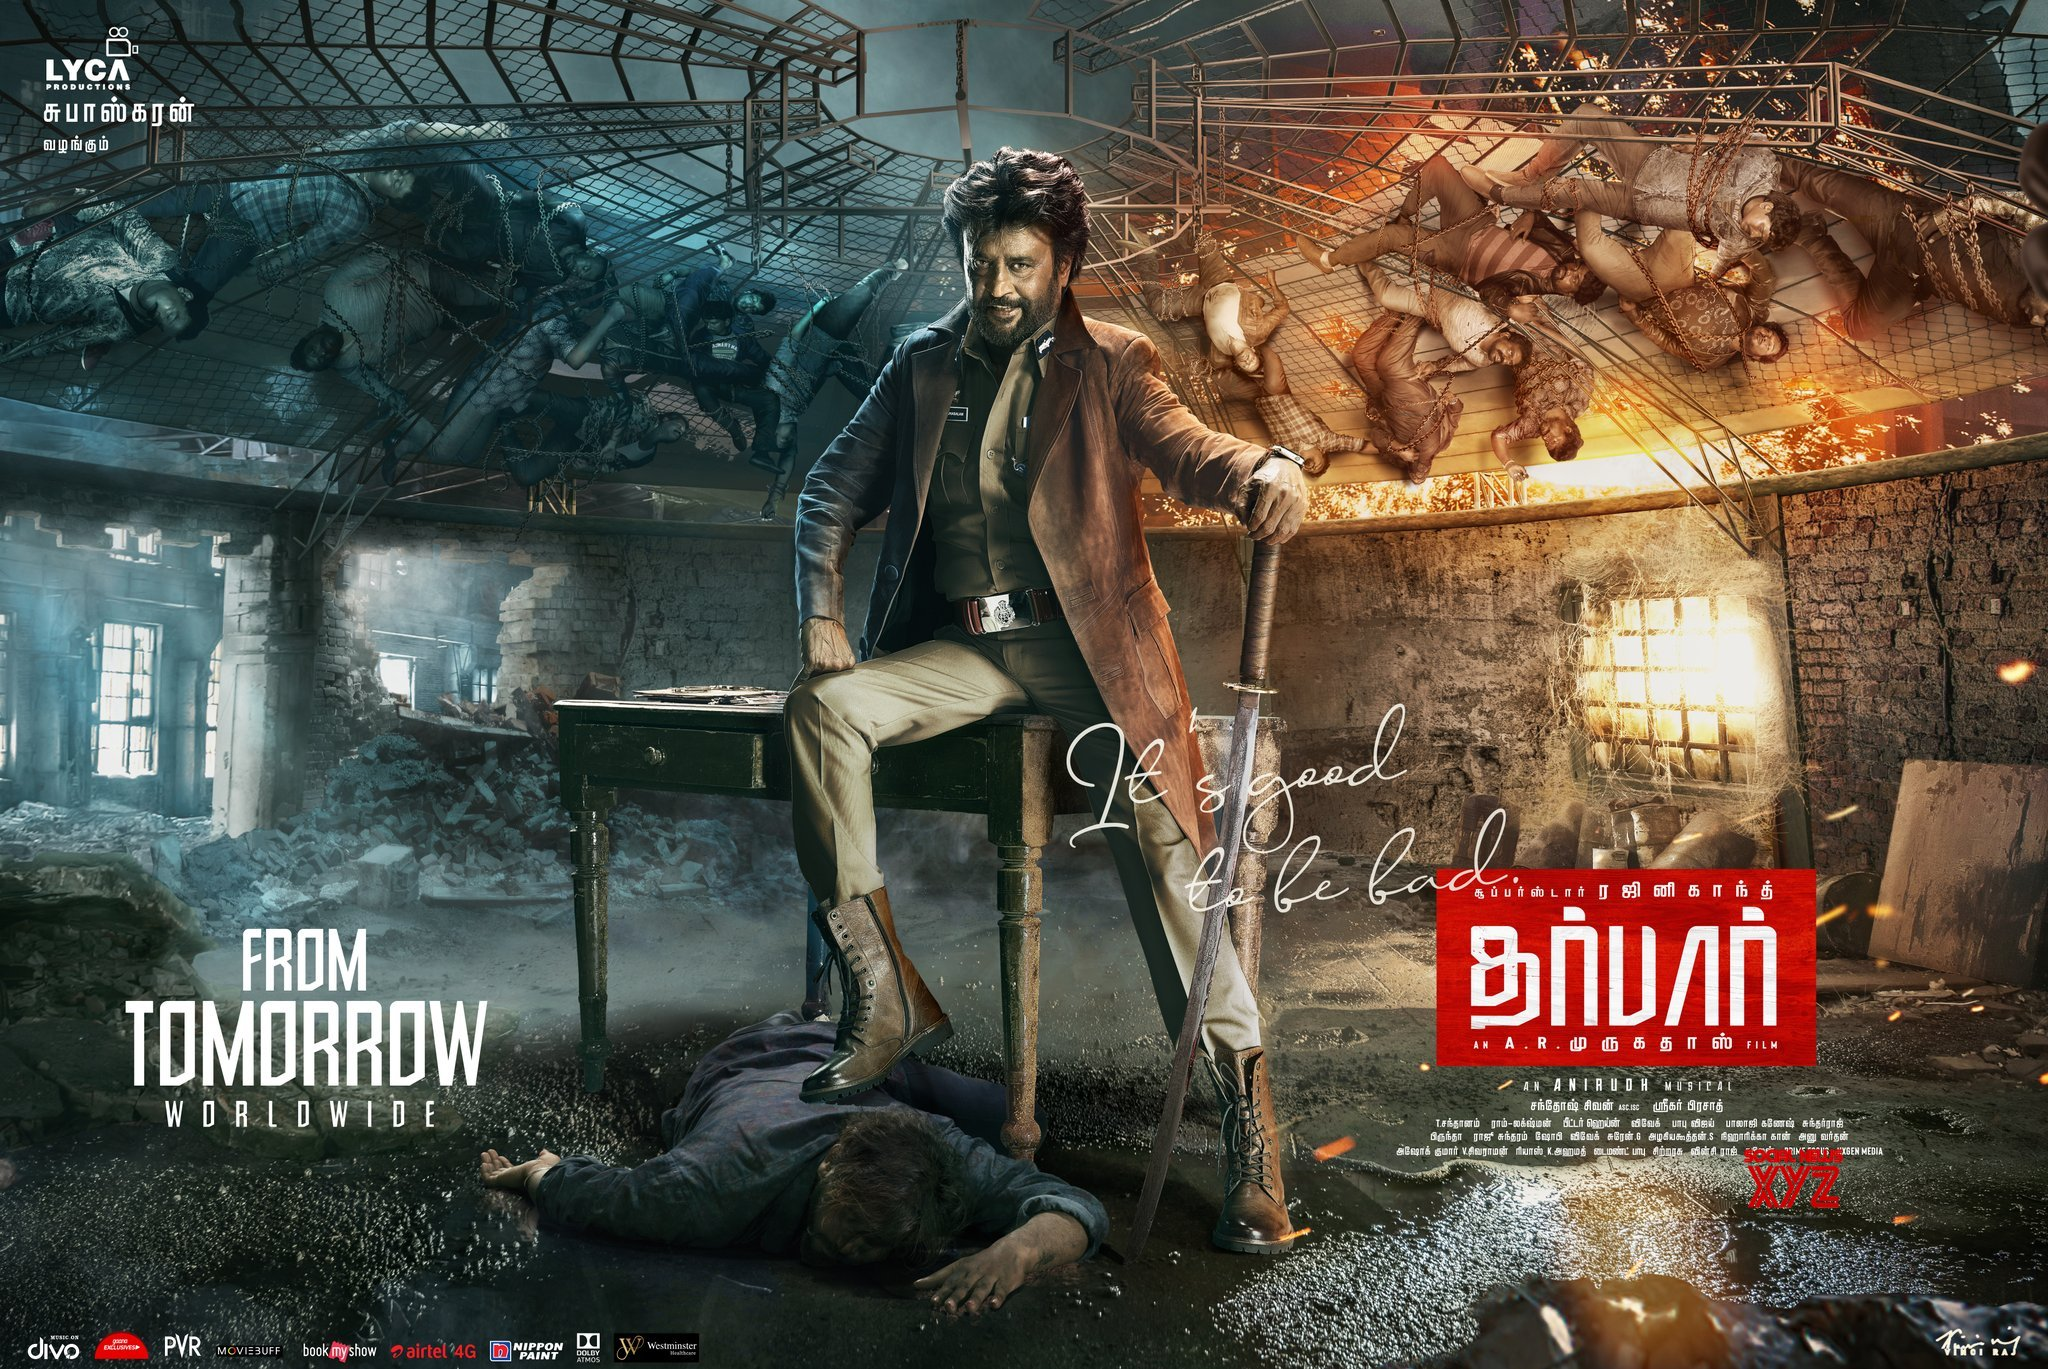 Superstar Rajinikanth Darbar Movie Sometimes It's Good To Be Bad Posters